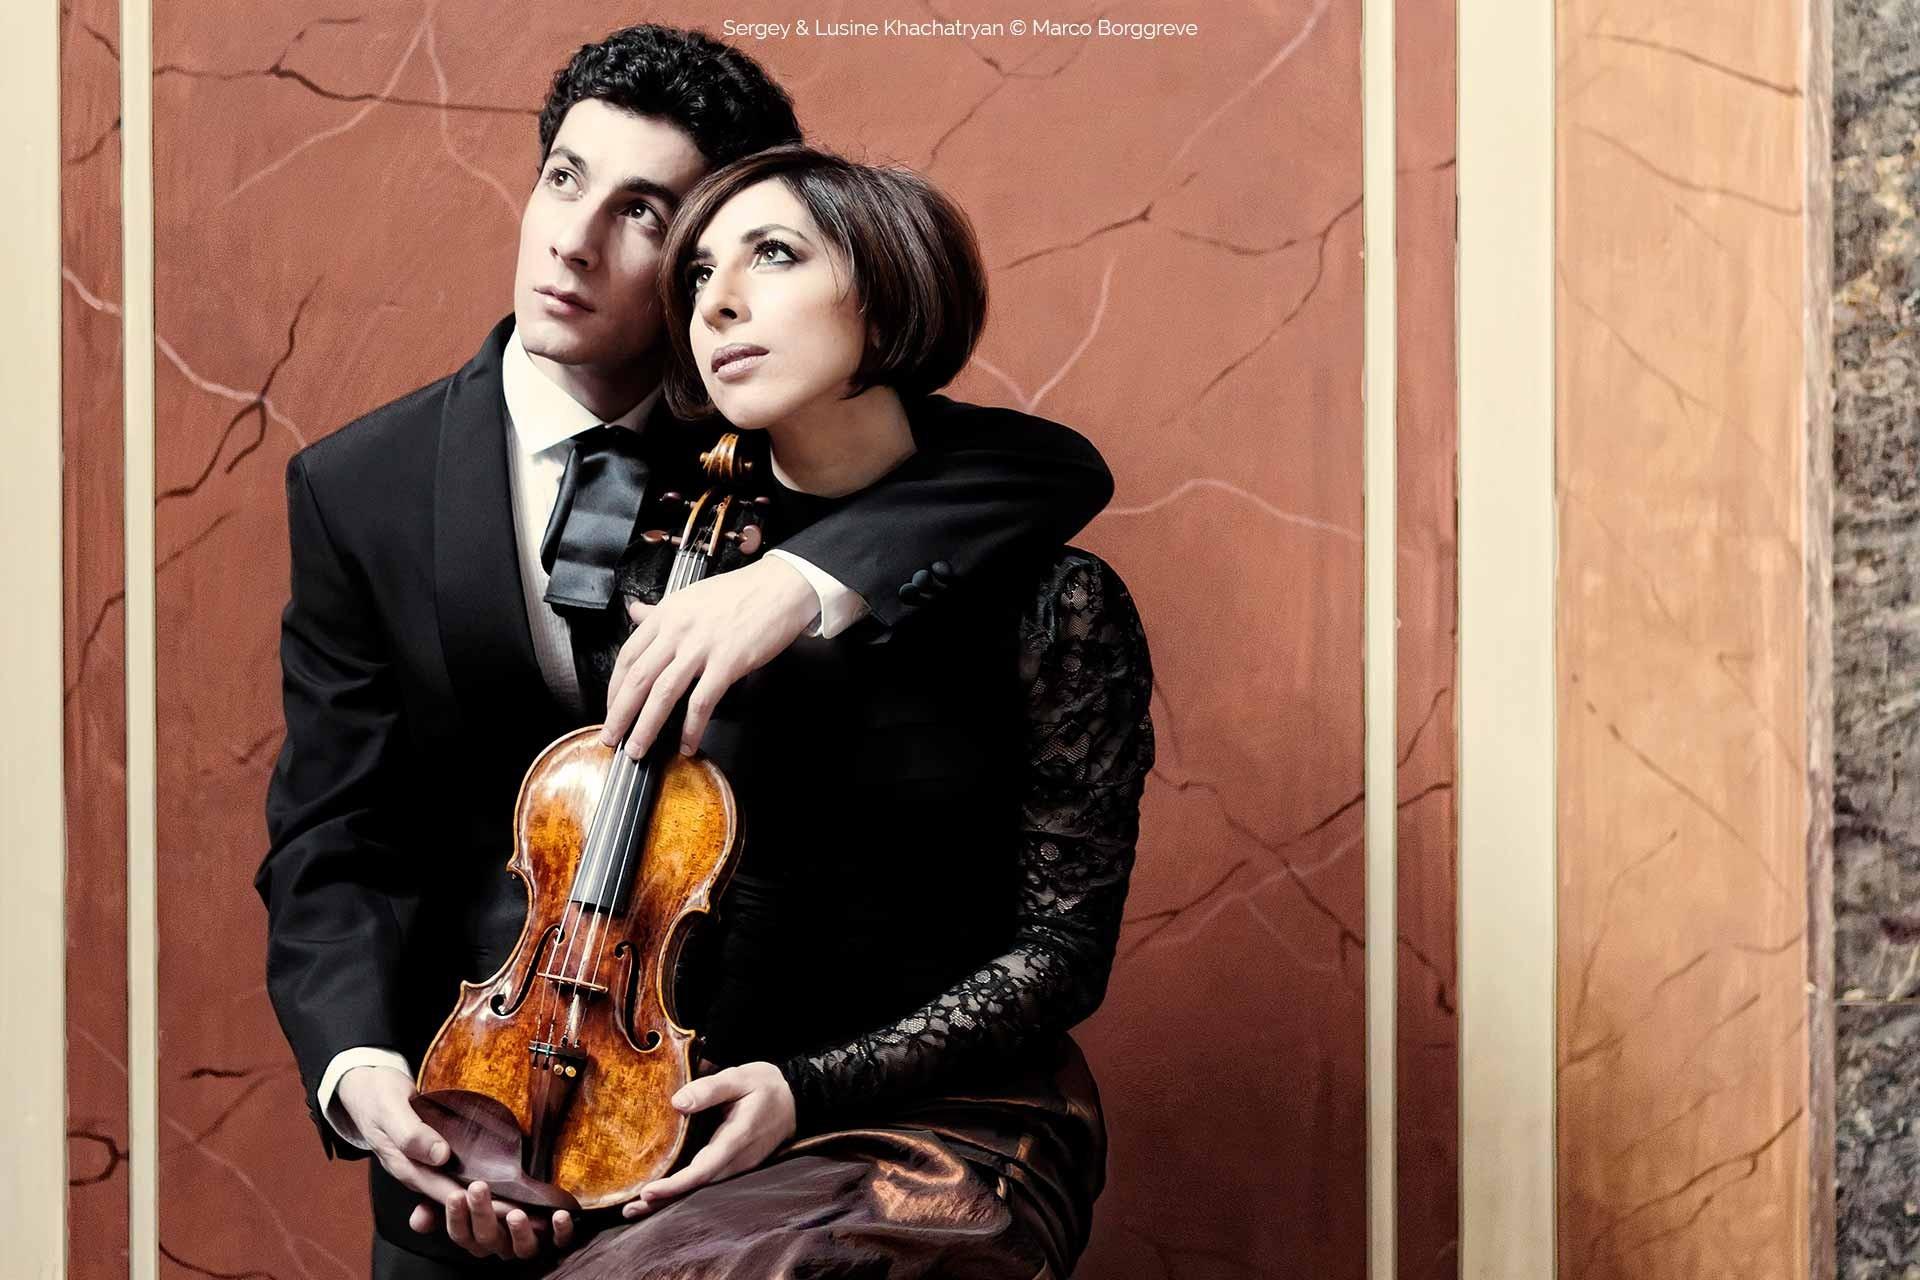 Sergey  &Lusine Khachatryan © Marco Borggreve